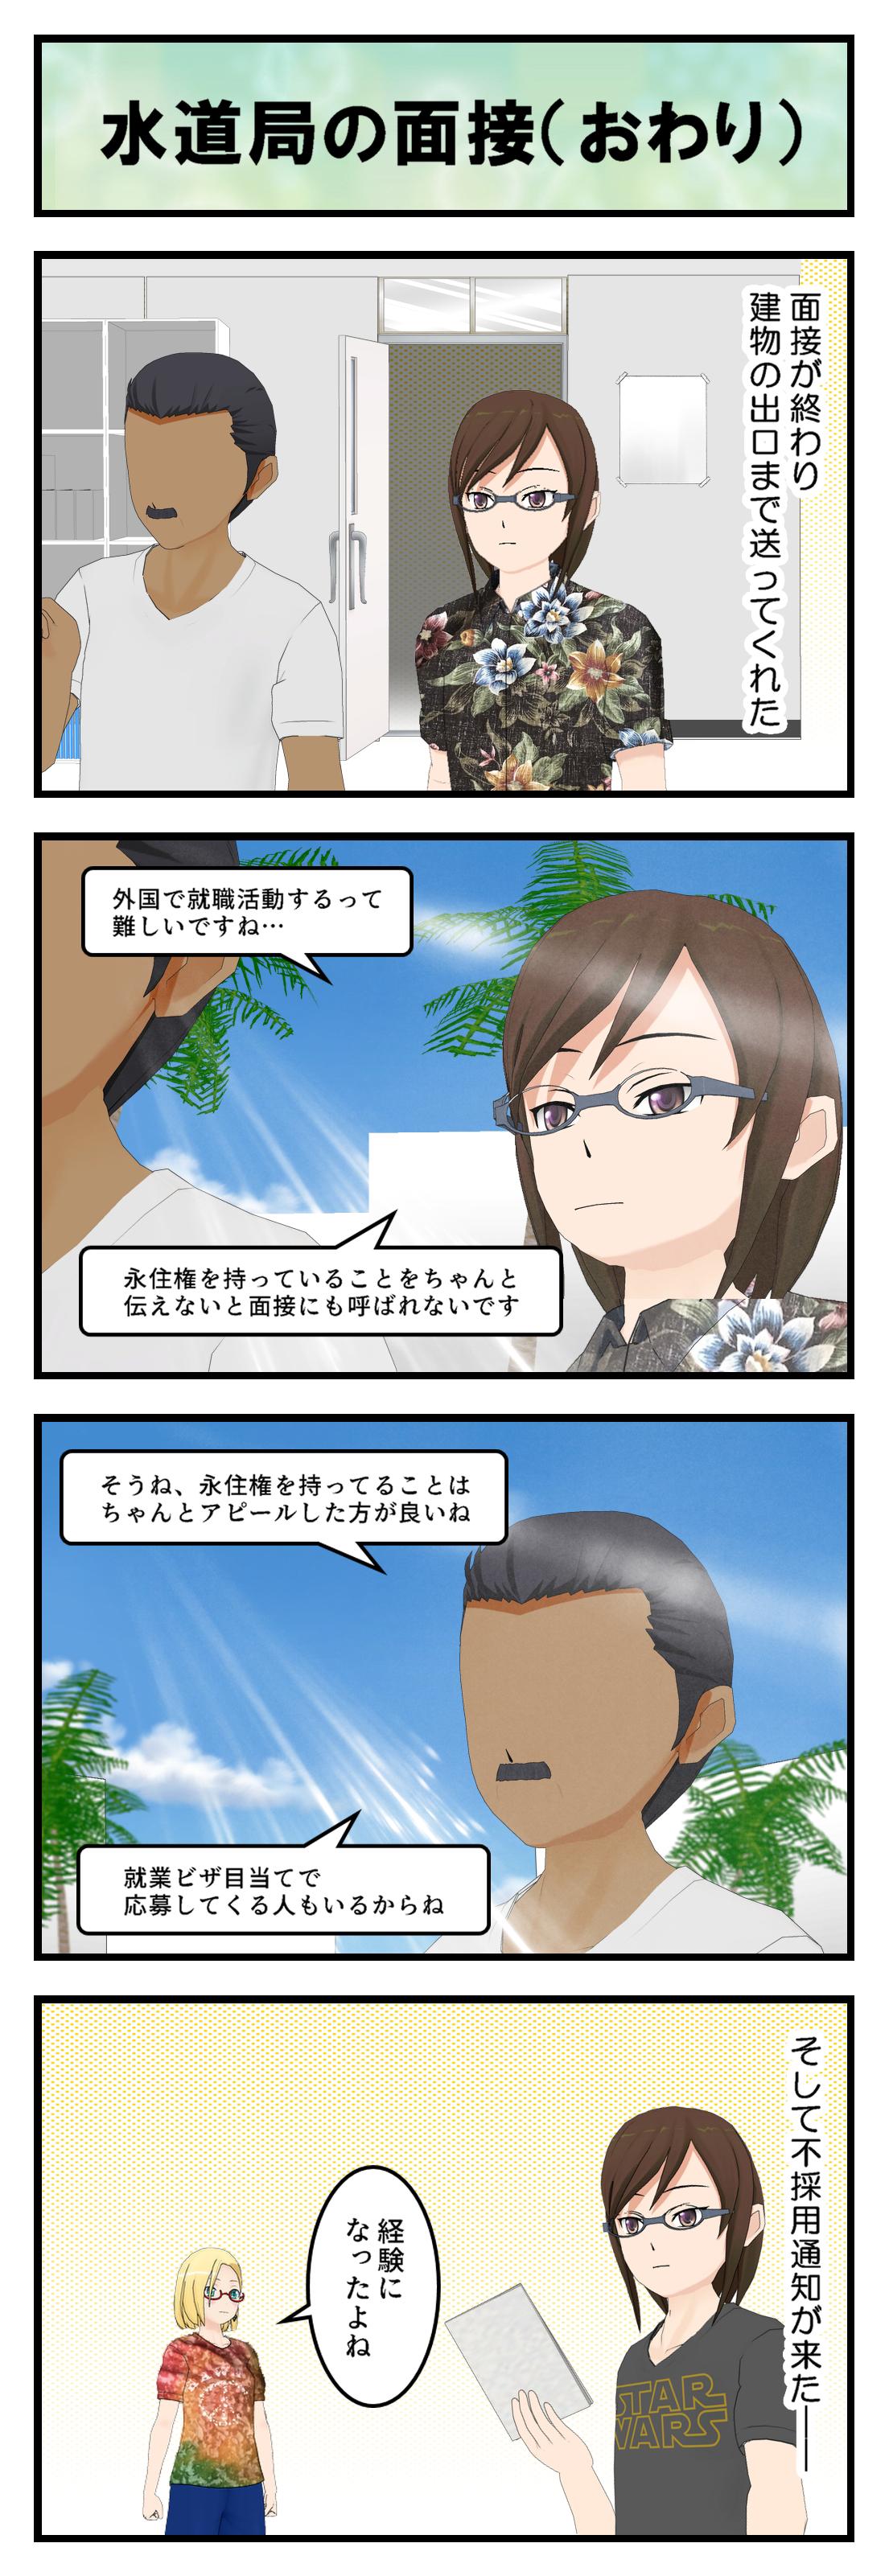 R464_水道局面接おわり_001